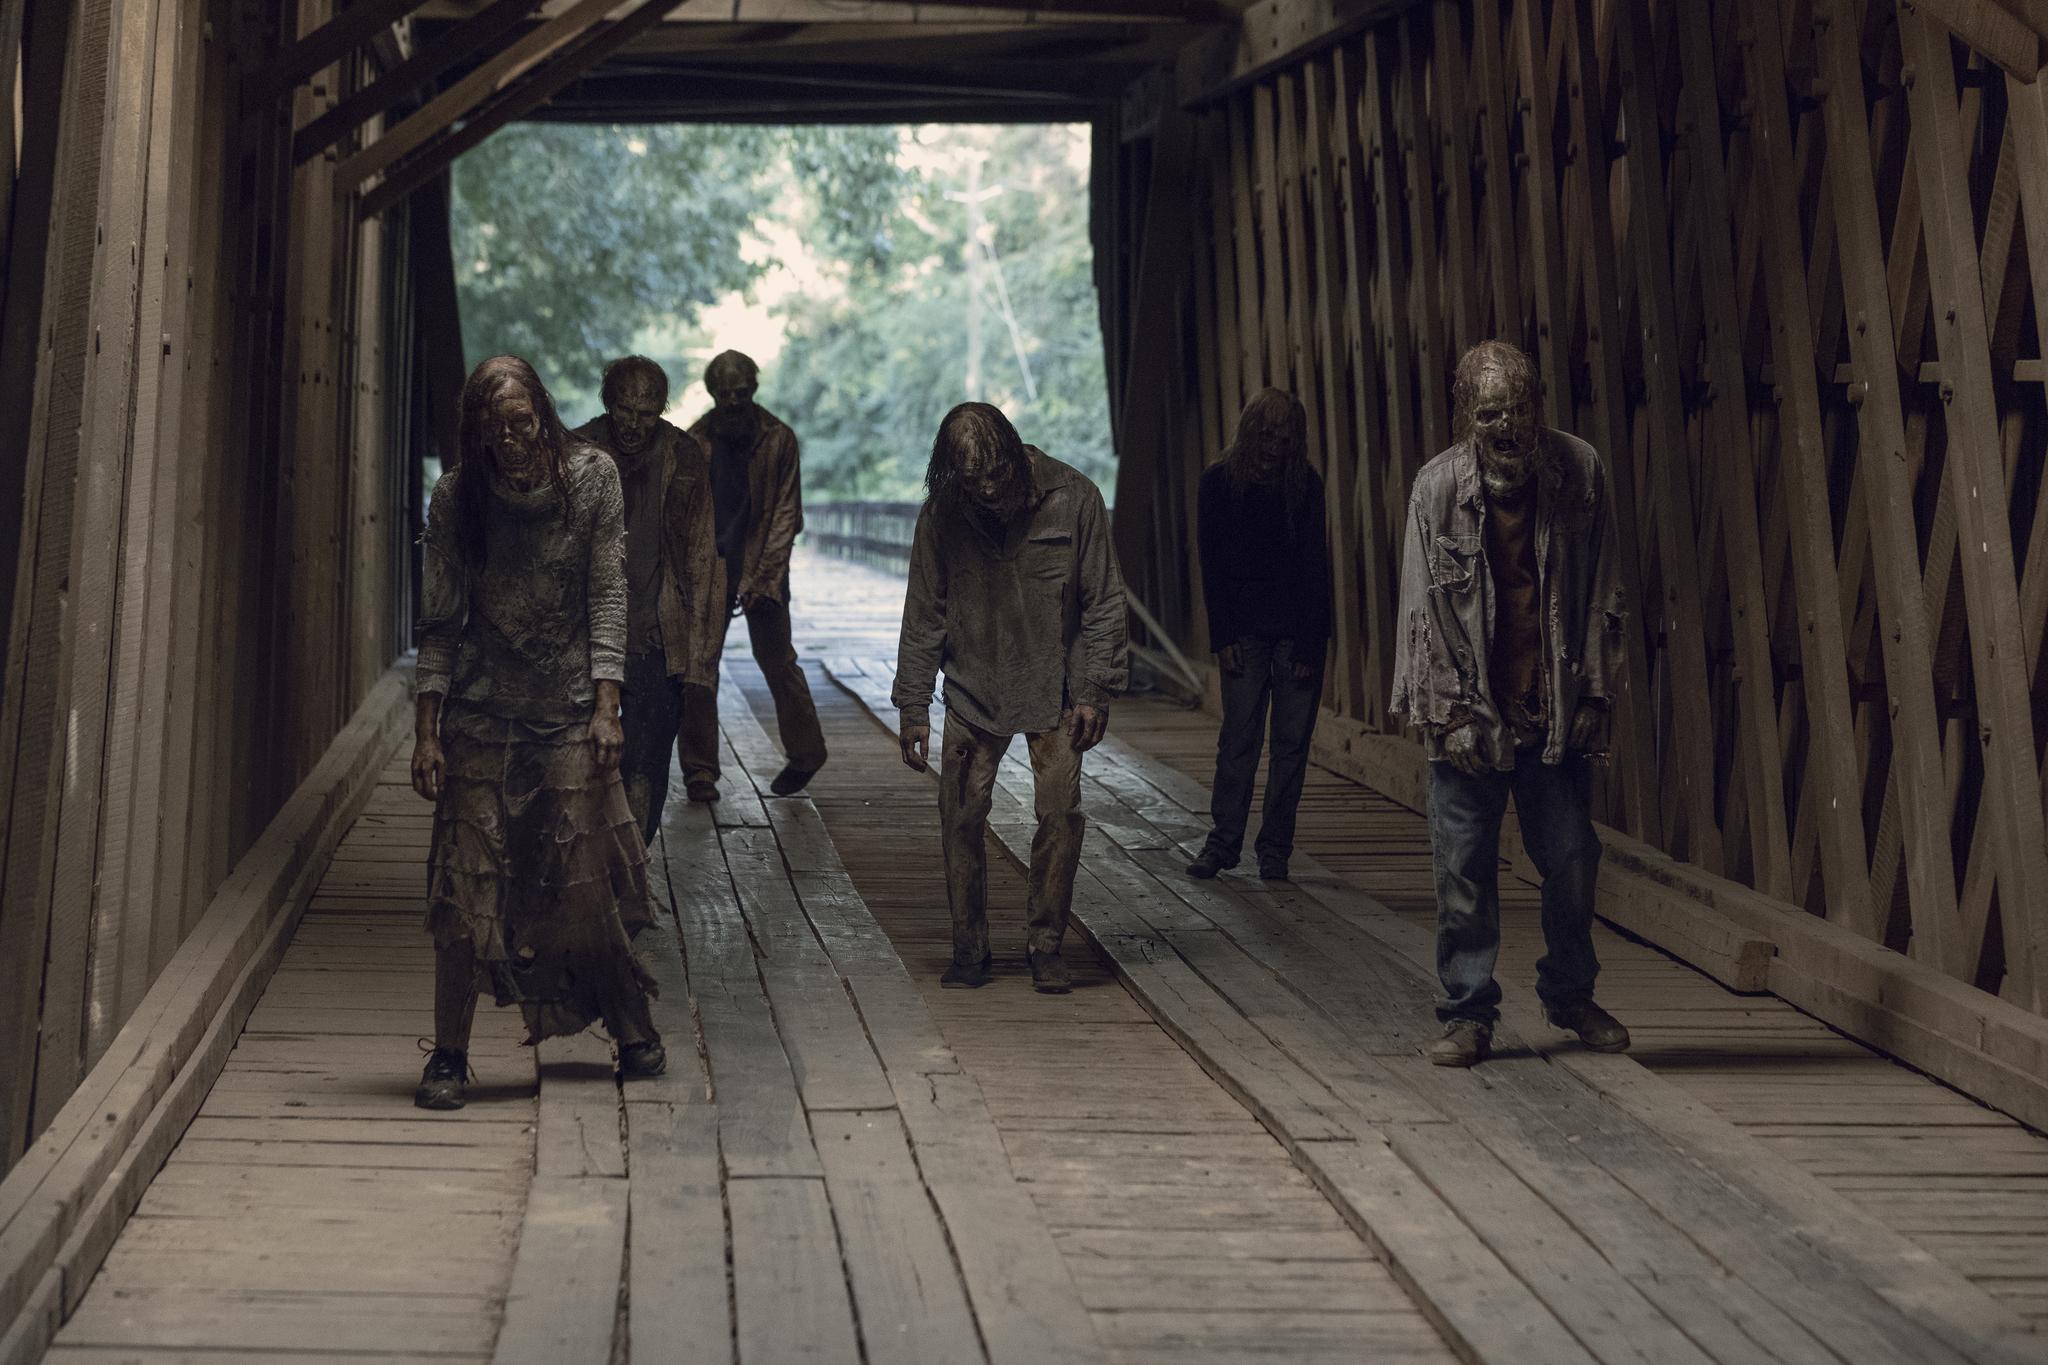 Renee Compton, Kayla Thompson, Summer Skye, Michael A. Thompson, David L. Marston, and Cassady McClincy in The Walking Dead (2010)